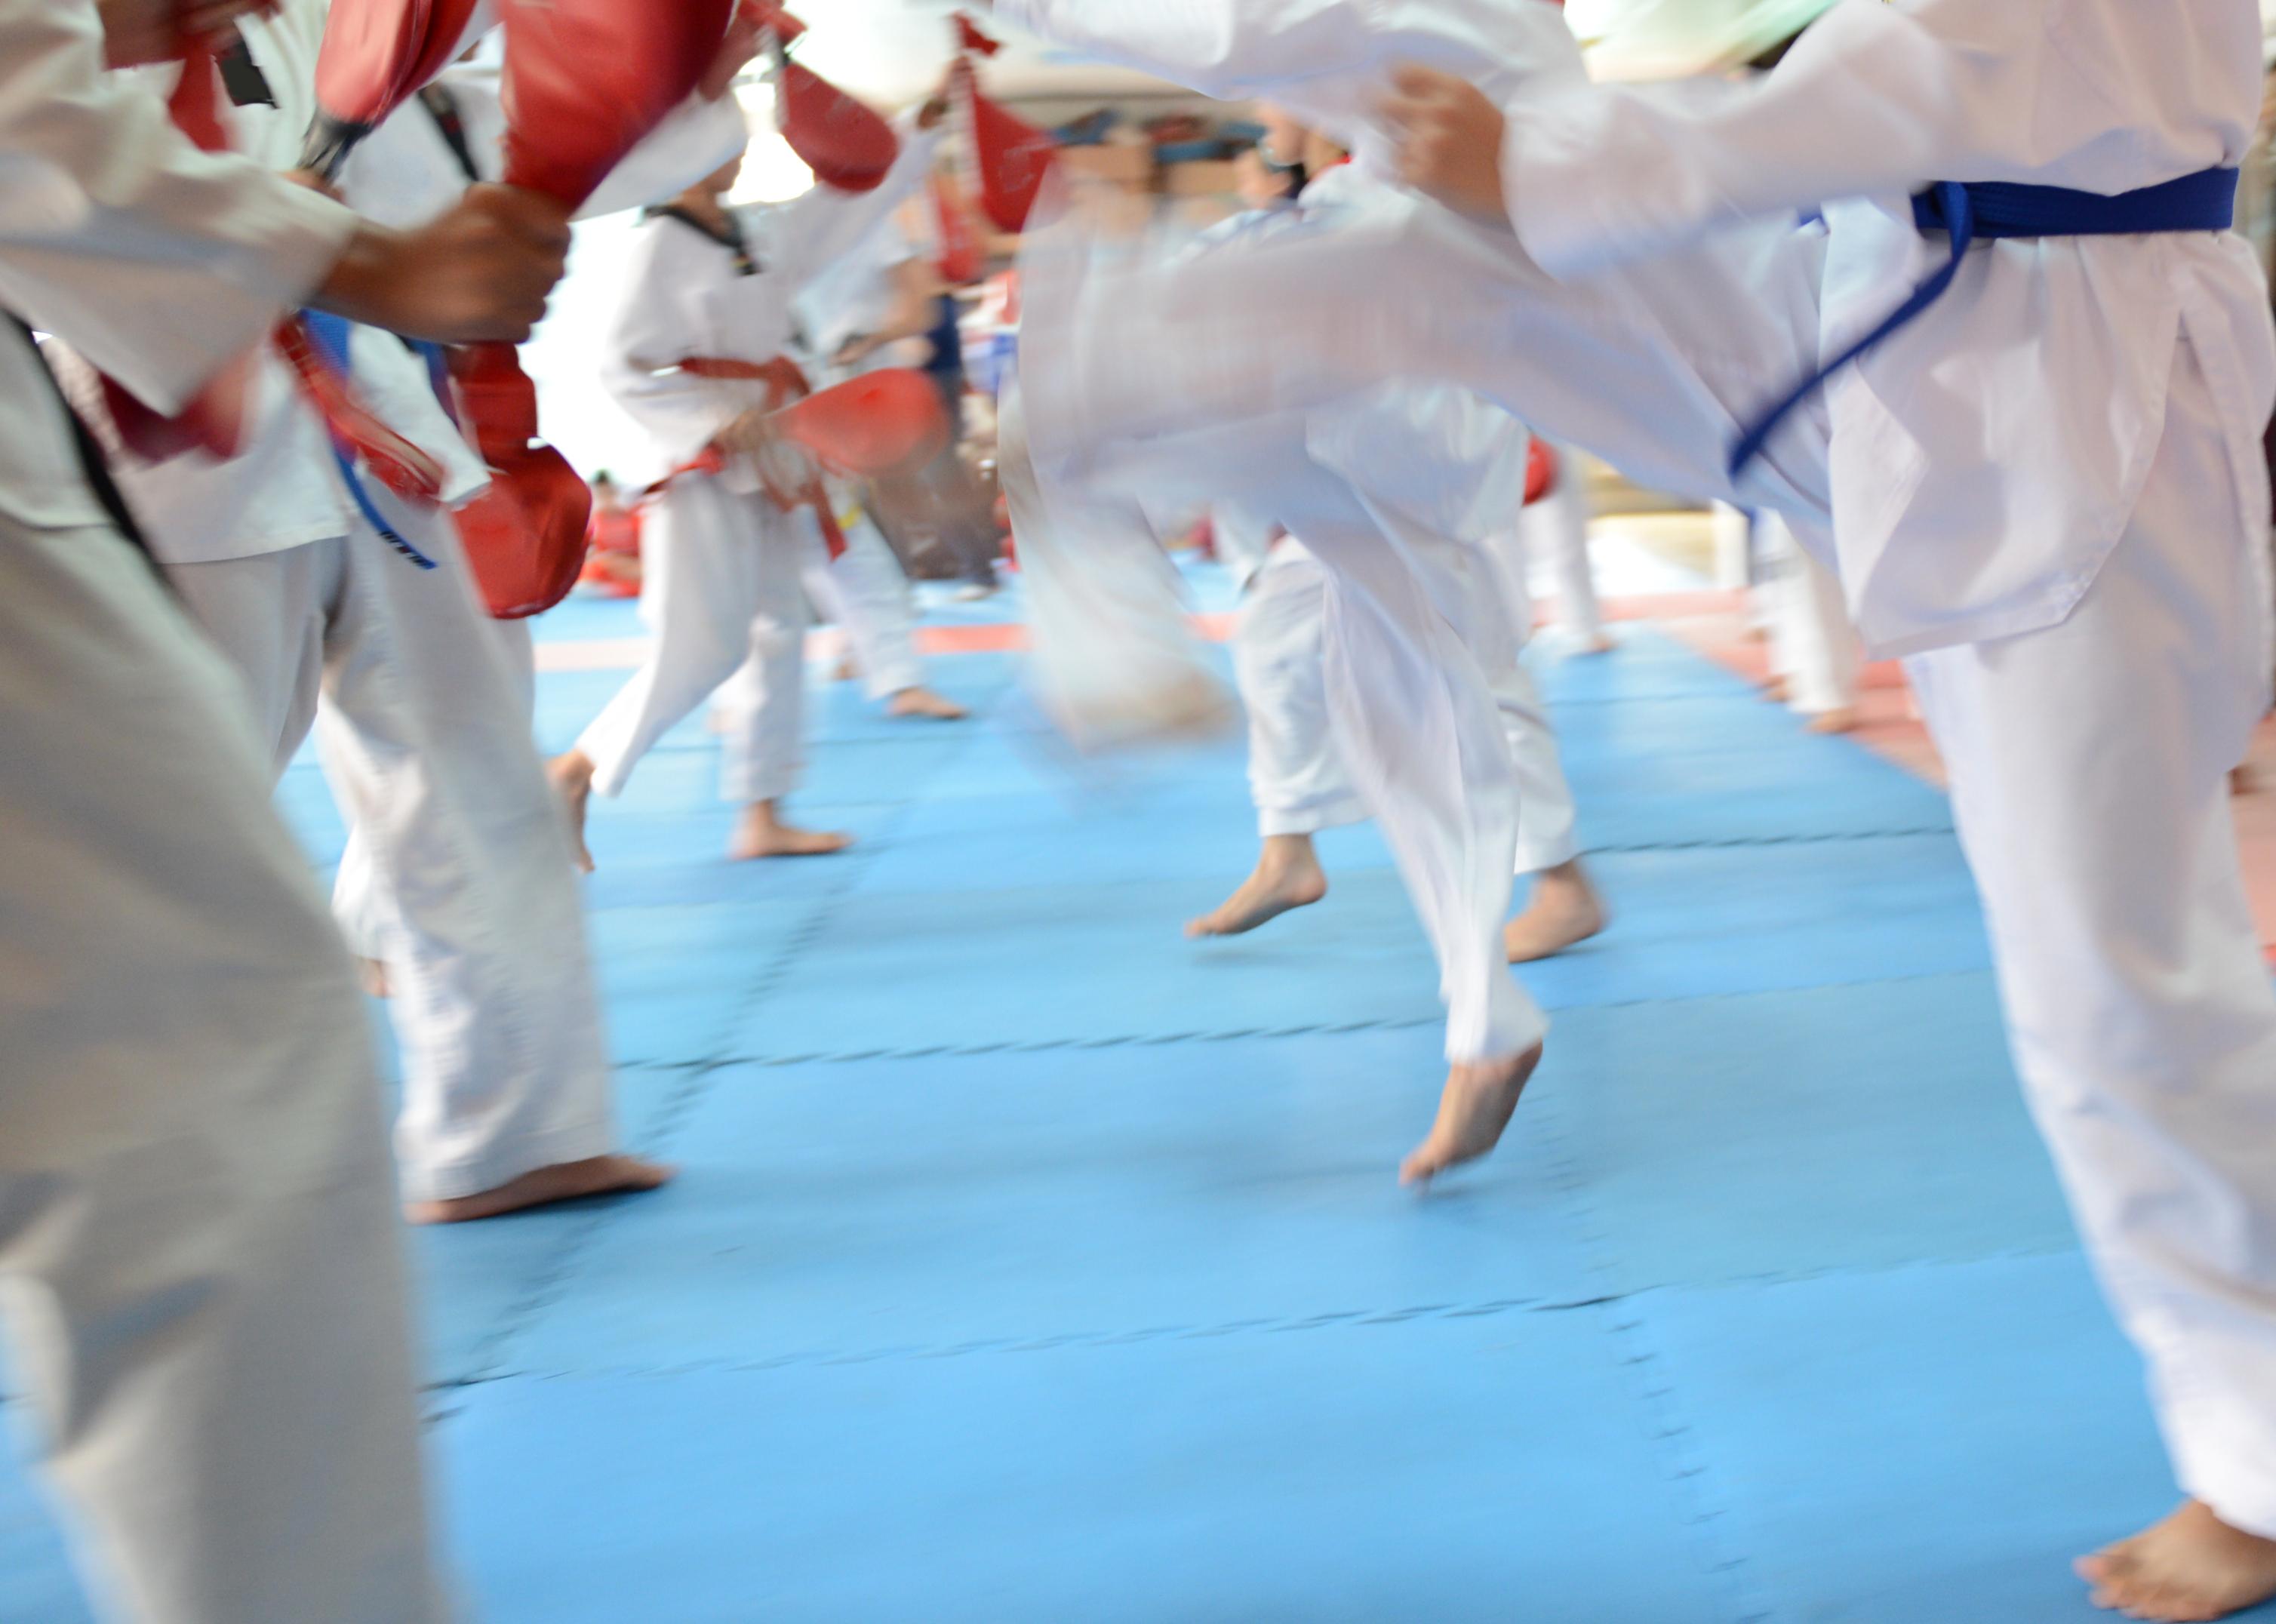 martial arts legs - shutterstock_159265079-2